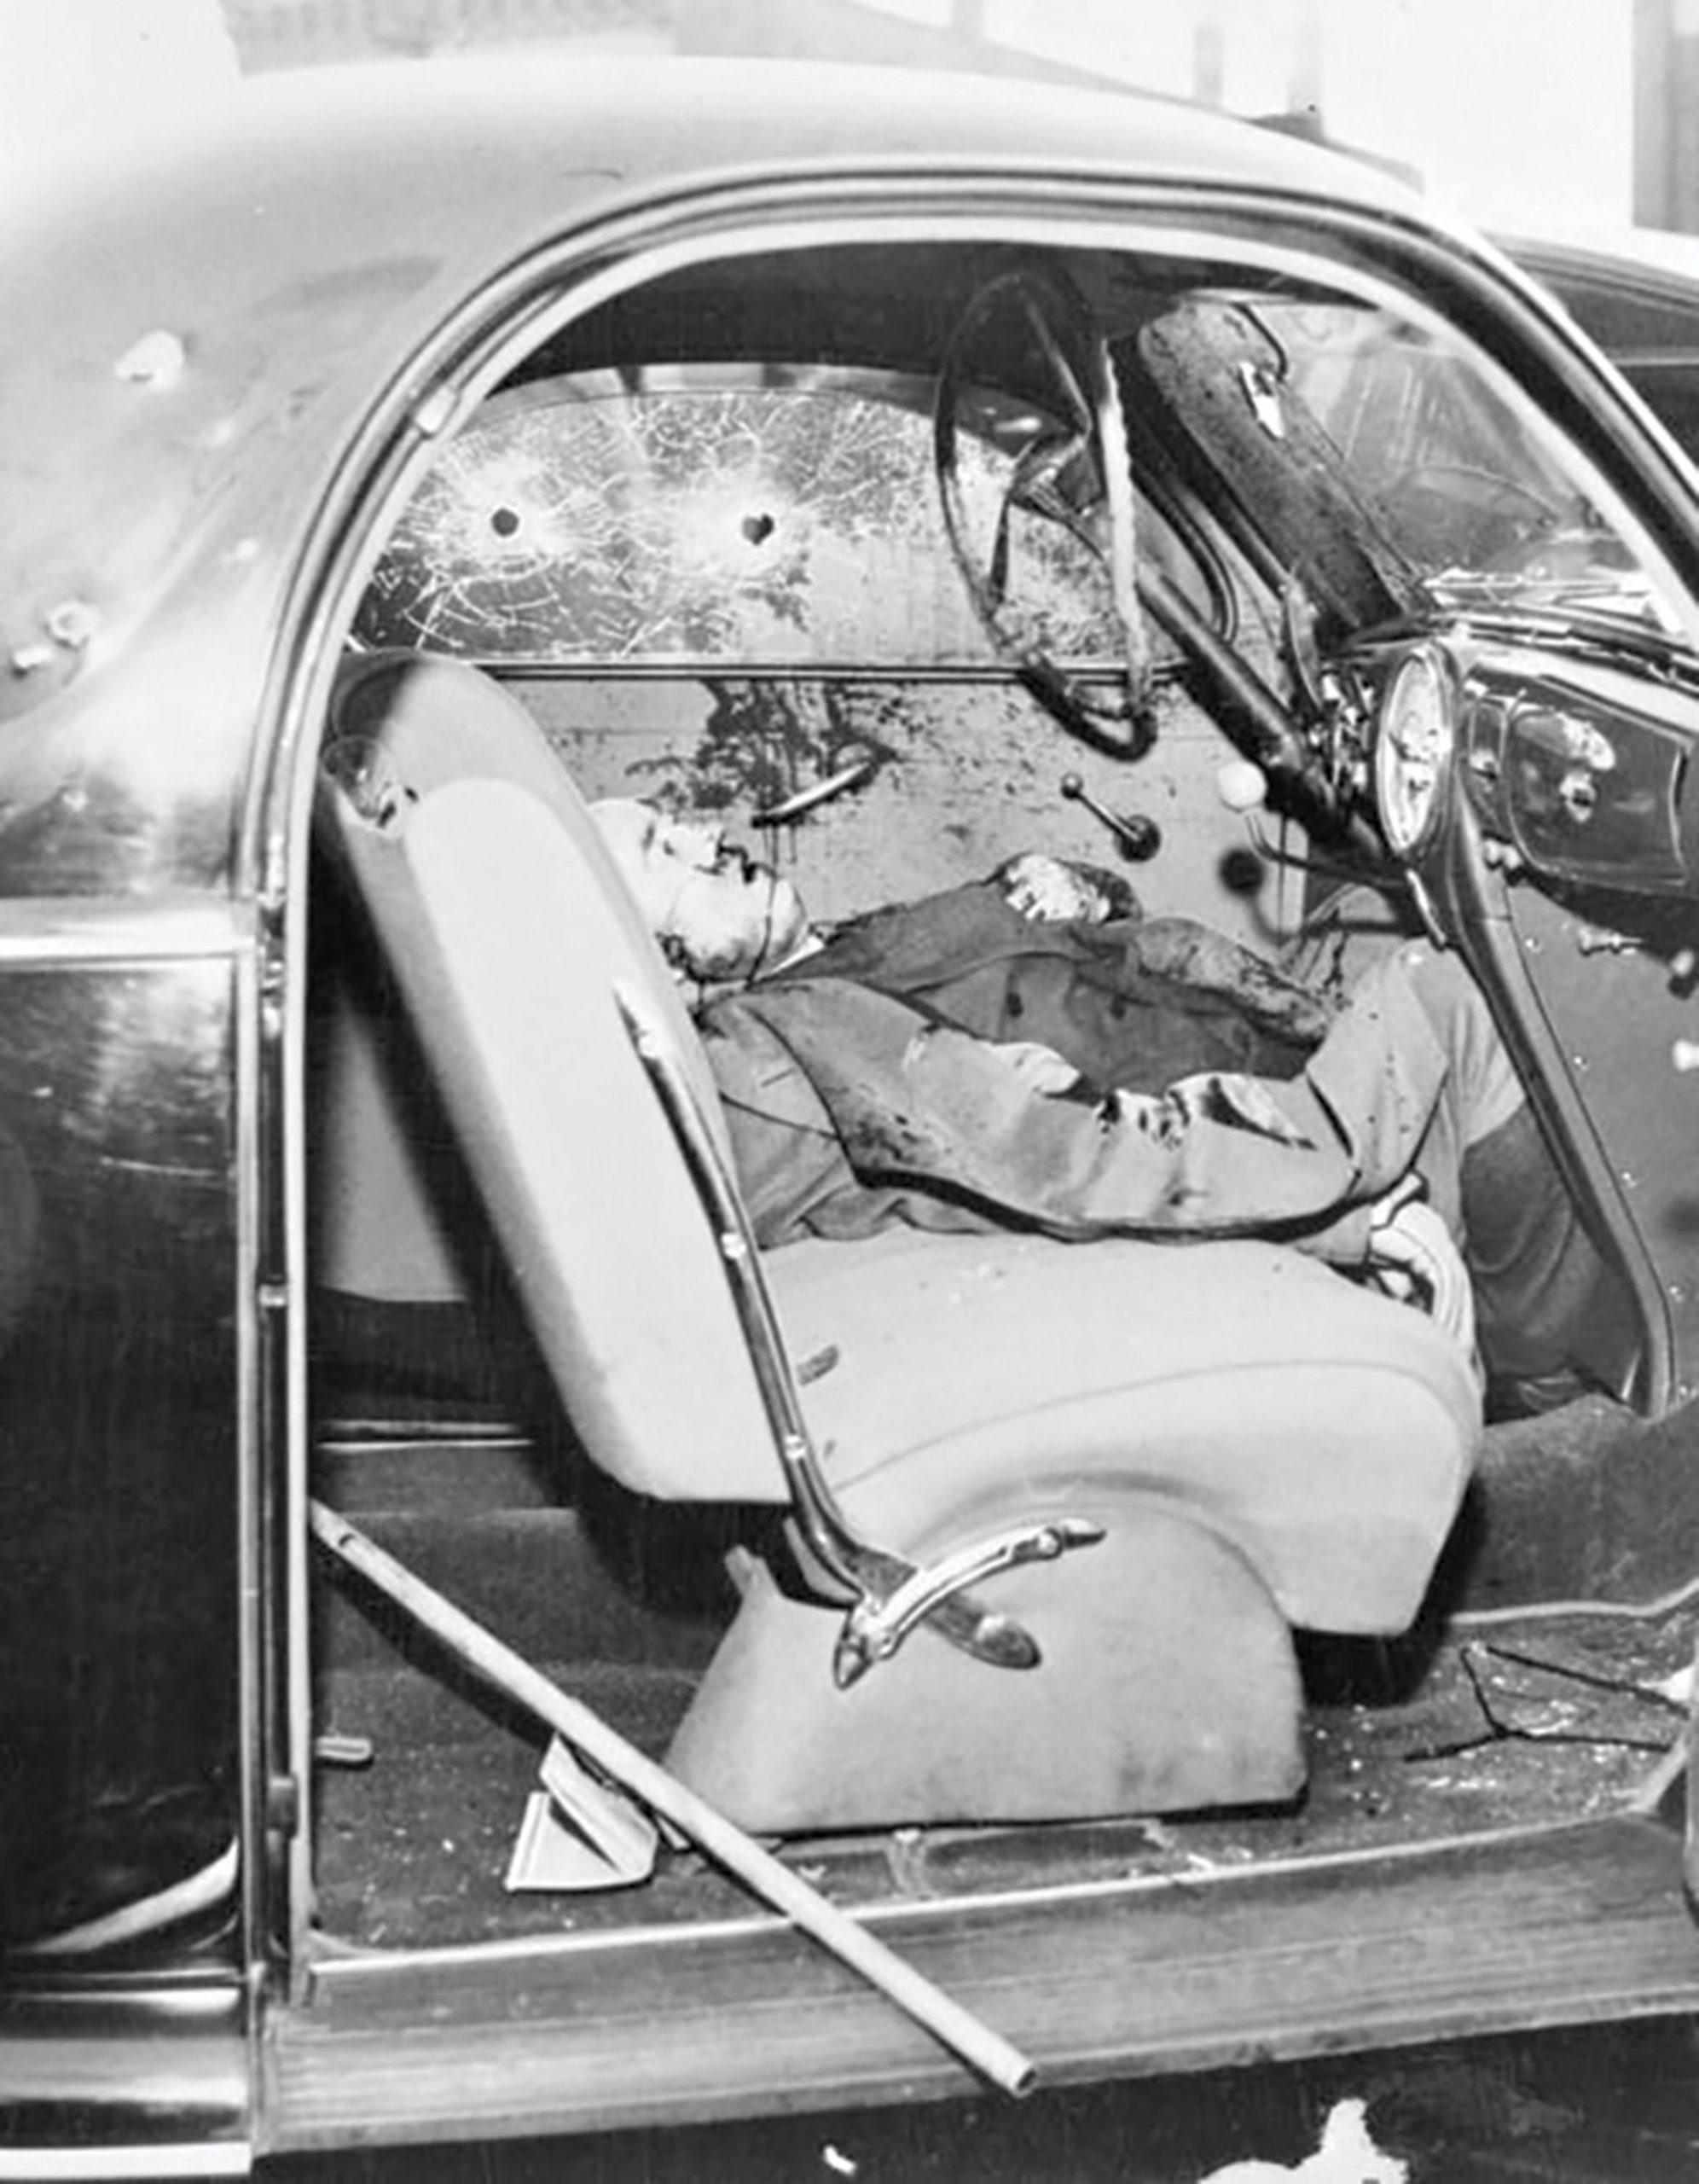 Edward O'Hare's 1939 murder drew Mafia suspicion to Sportsman's Park; Photo courtesy Chicago Tribune